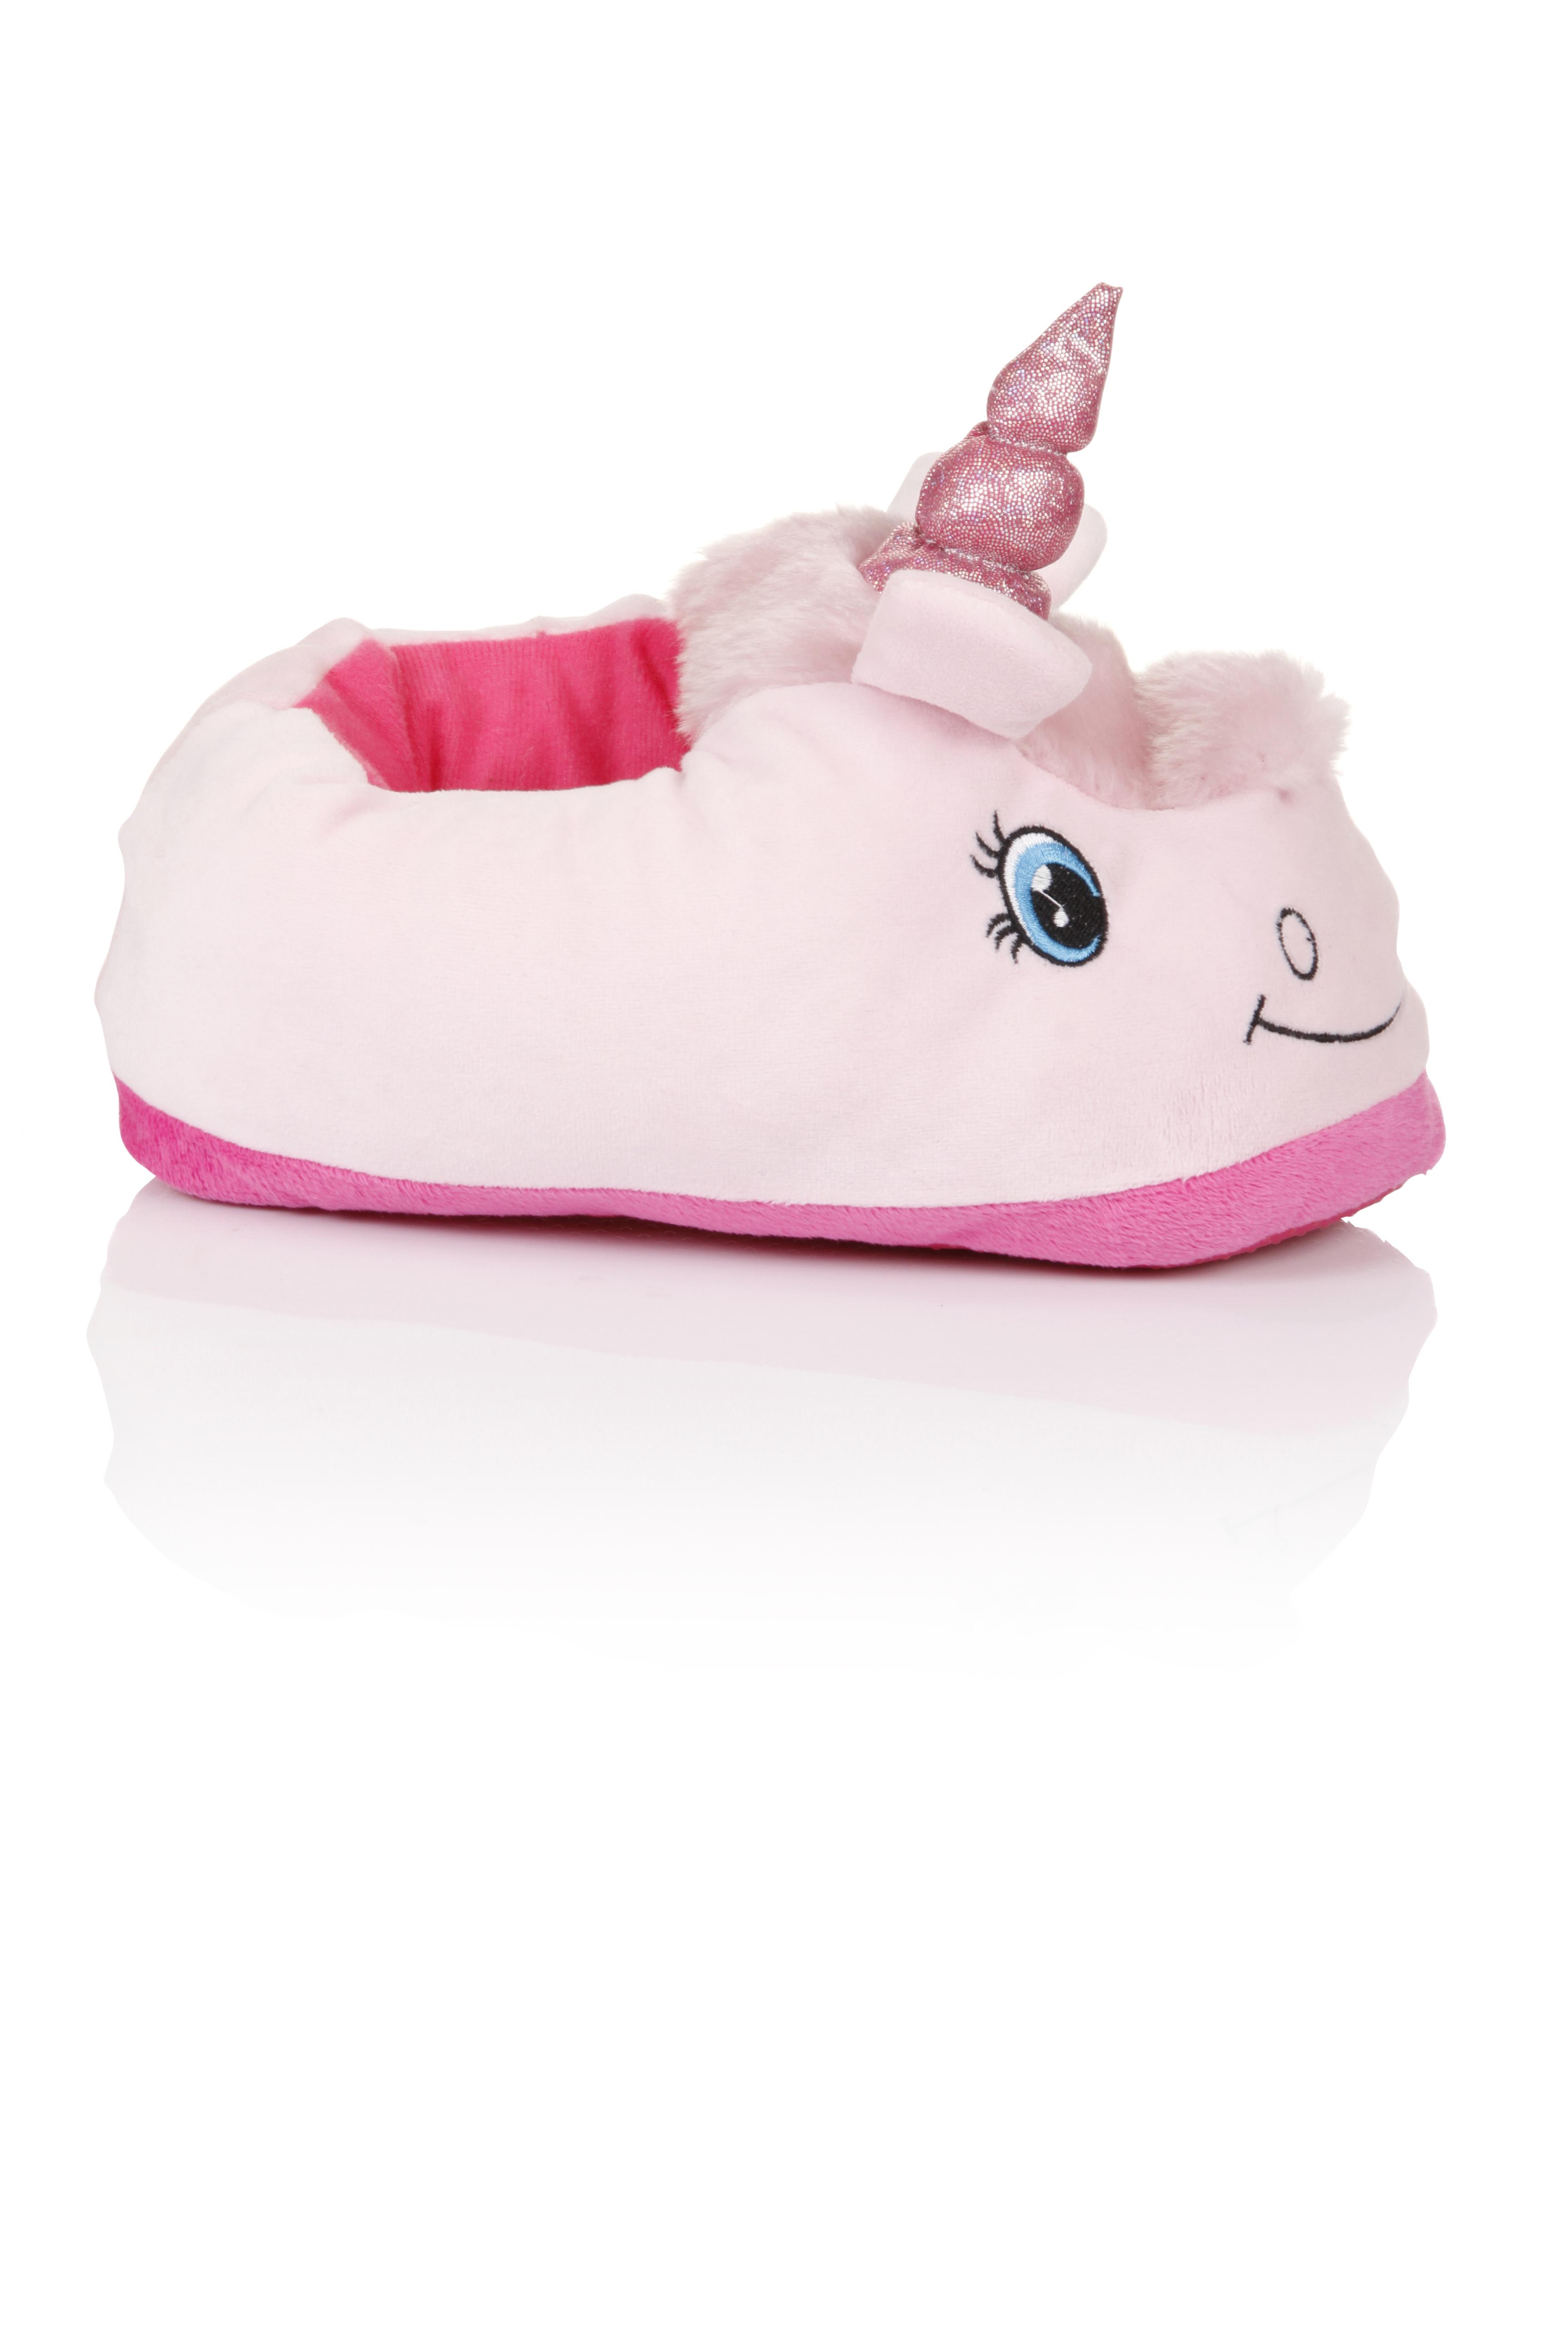 Nifty Kids Girls 3D Unicorn Slippers Cute Fantasy Animal Novelty